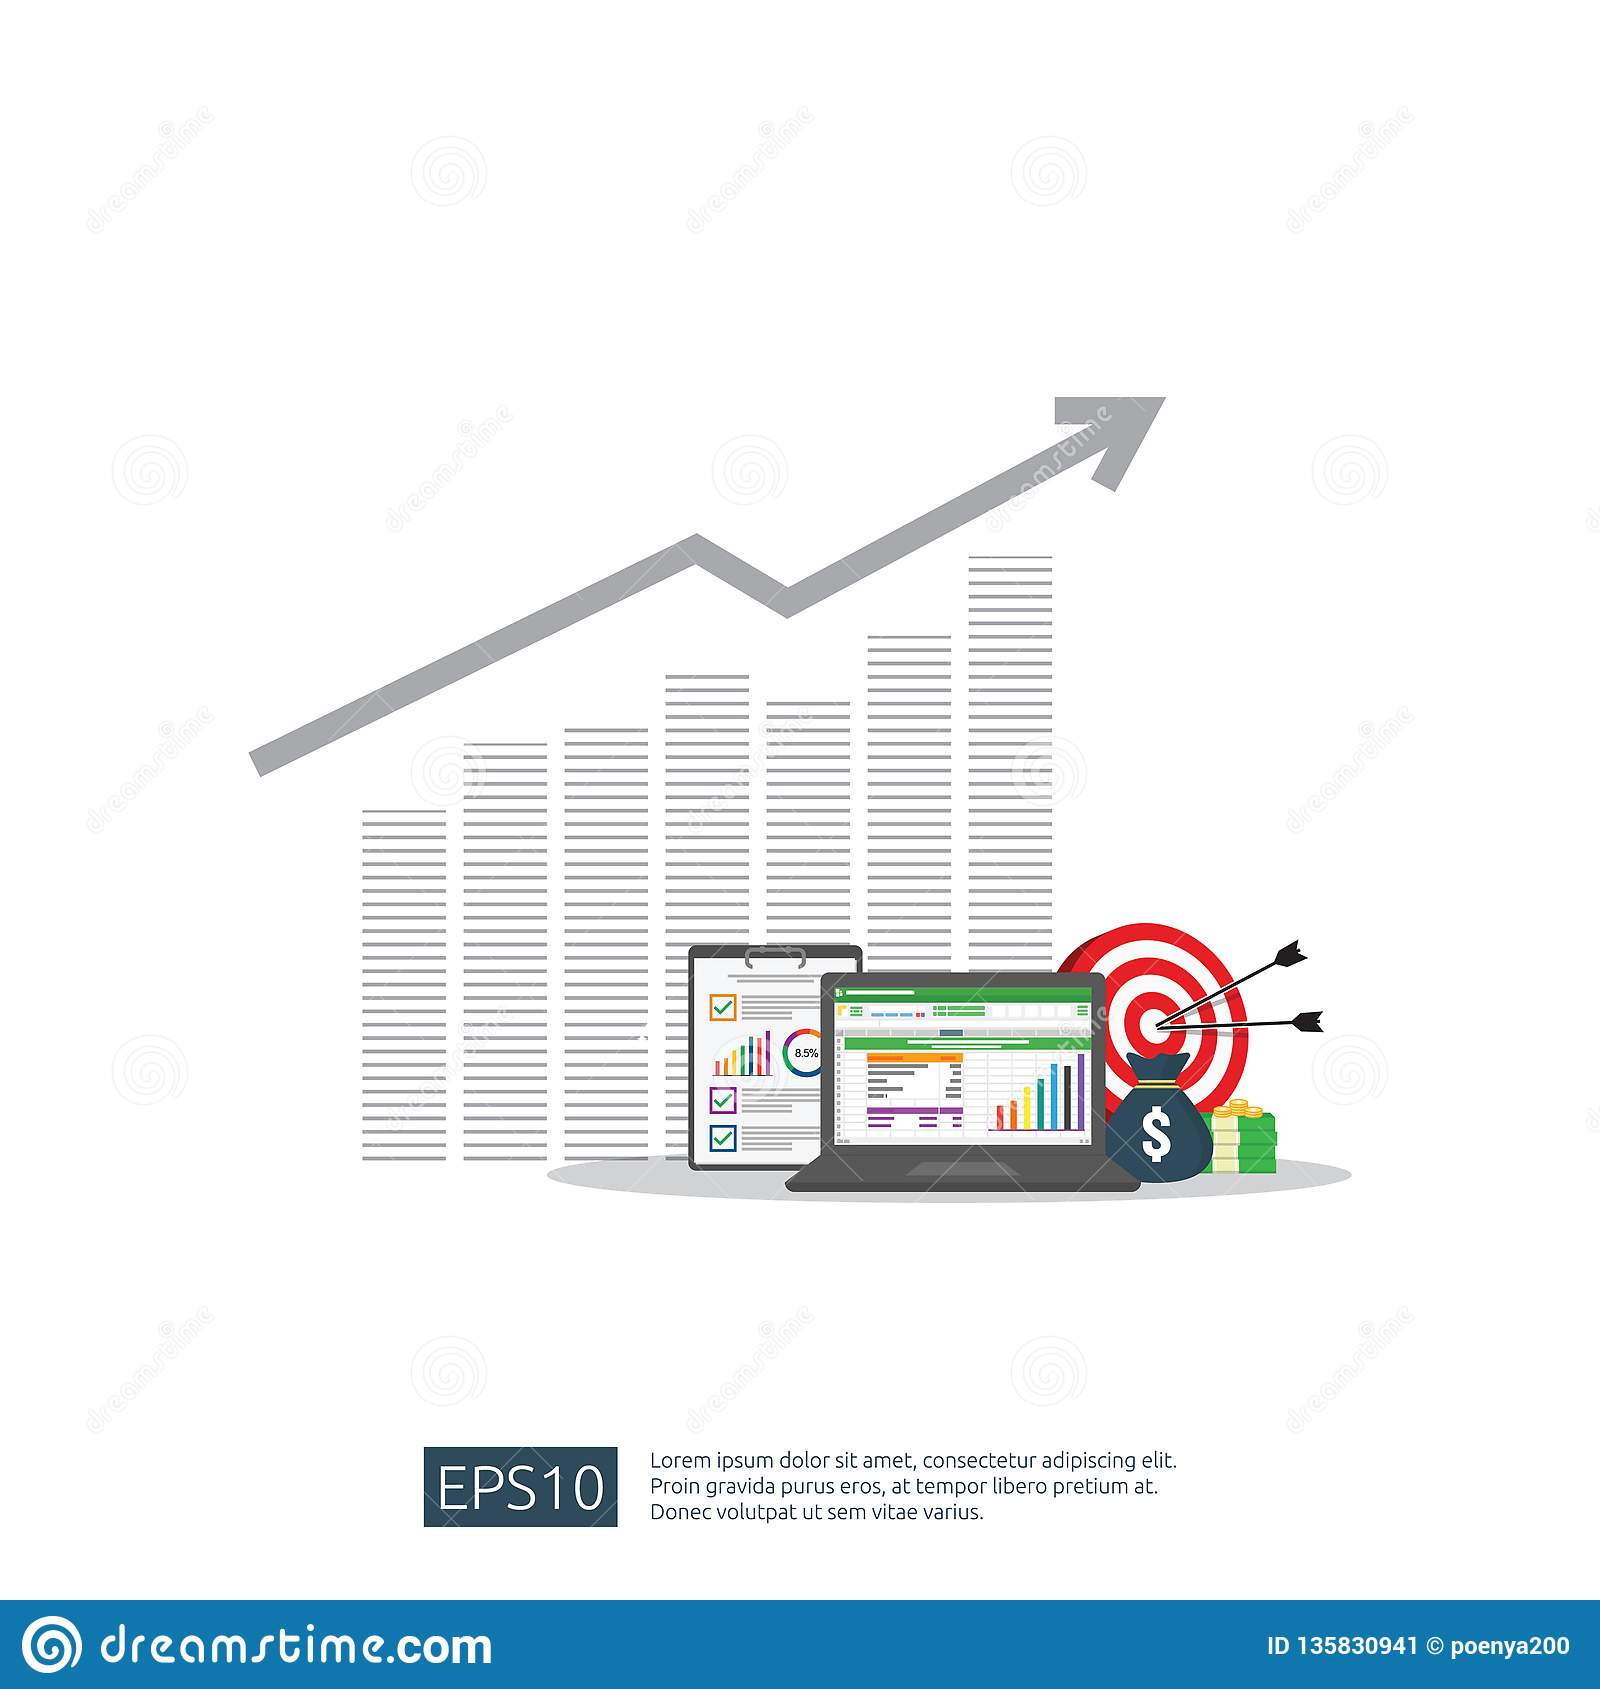 Roi Analysis Spreadsheet pertaining to Big Data Analysis On Screen. Seo Analytic Or Spreadsheet Business